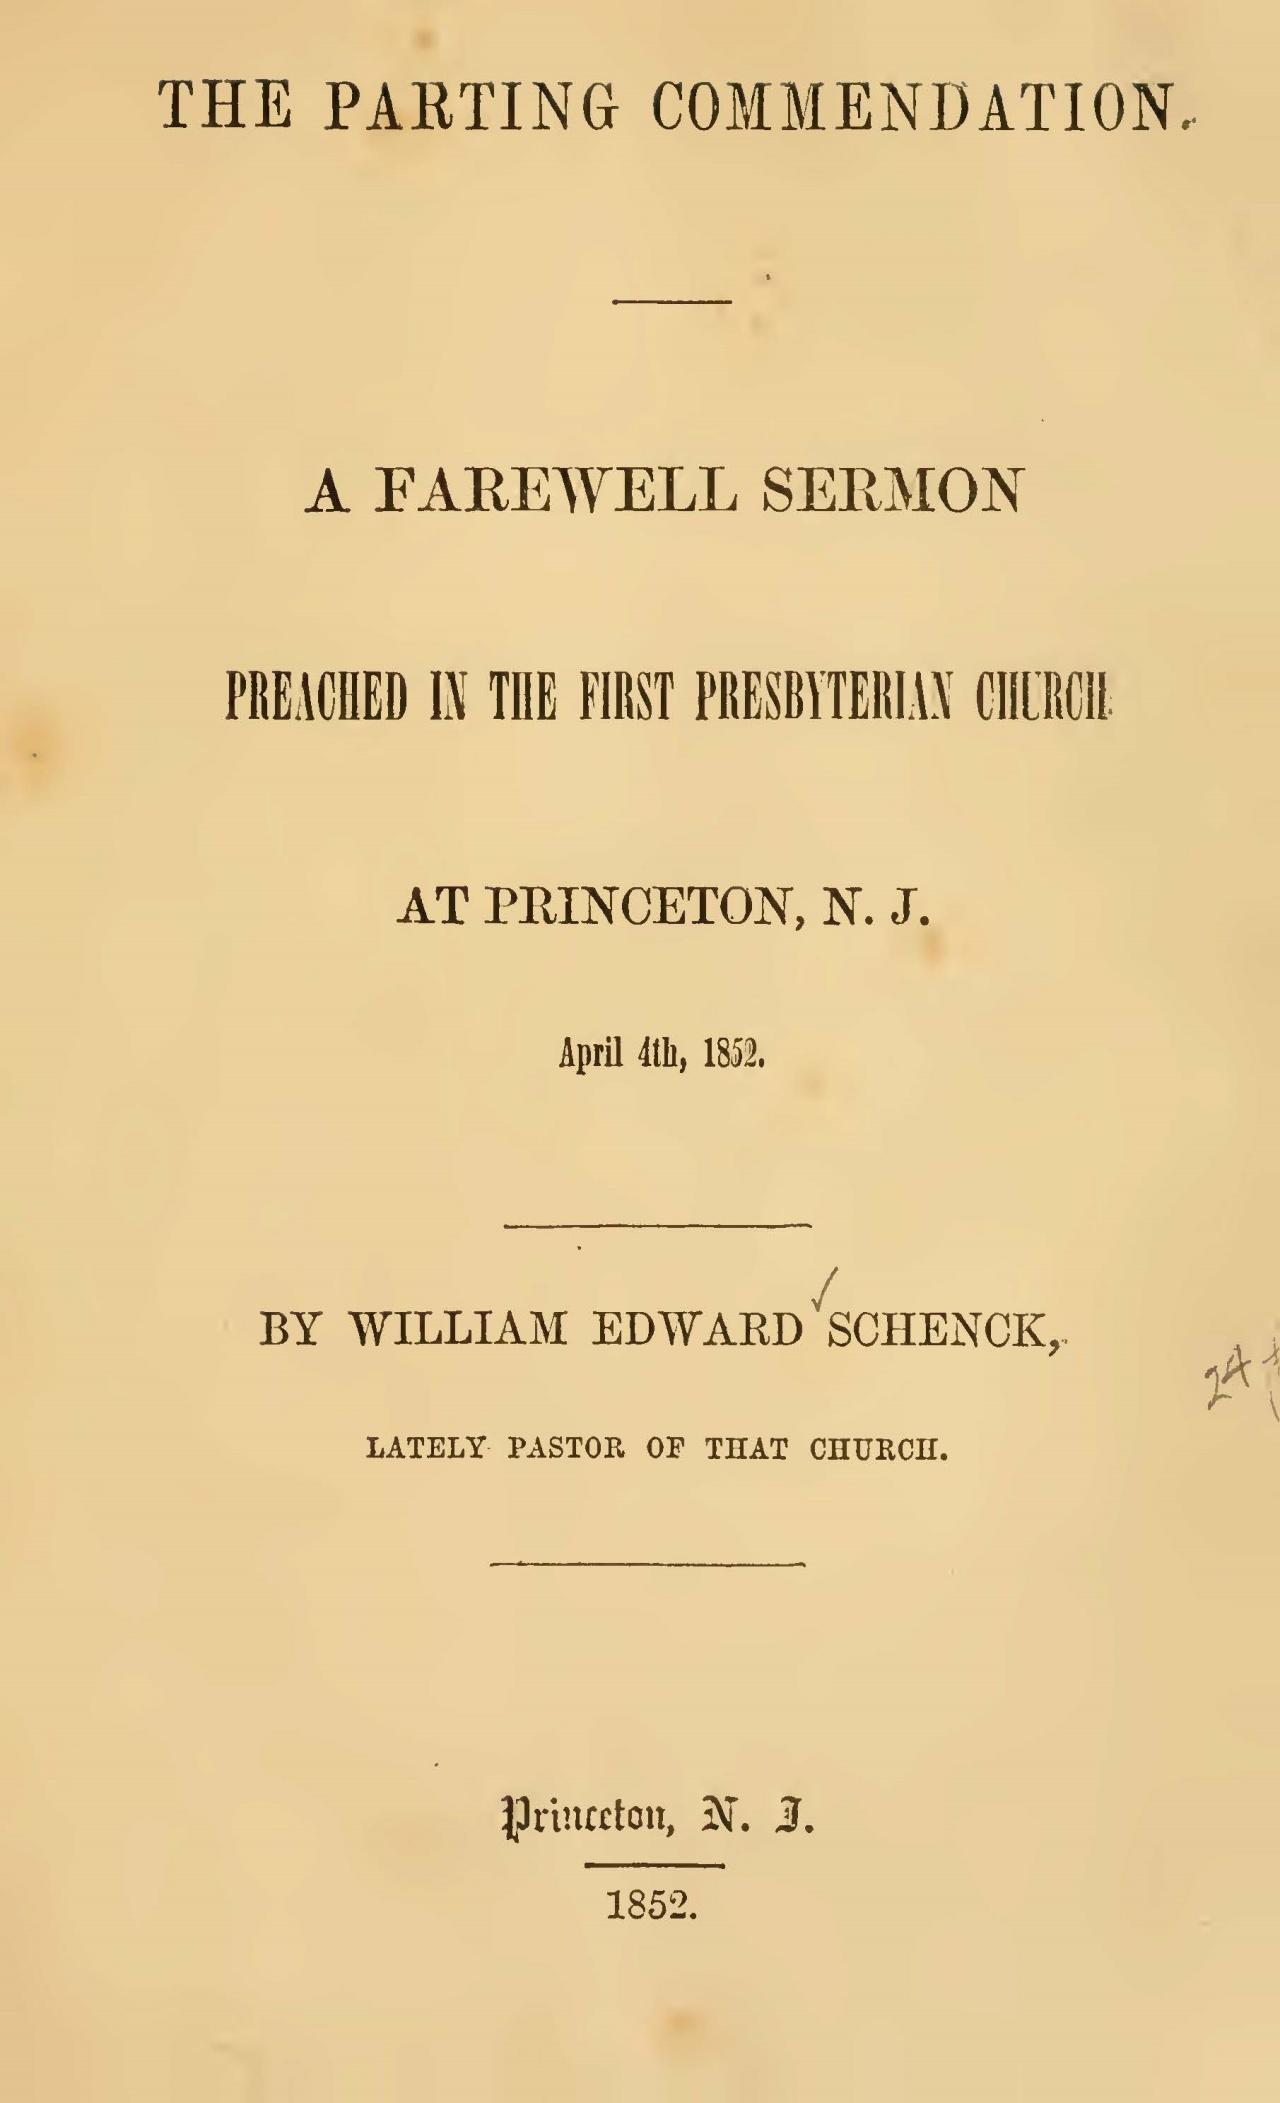 Schenck, William Edward, The Parting Commendation Title Page.jpg